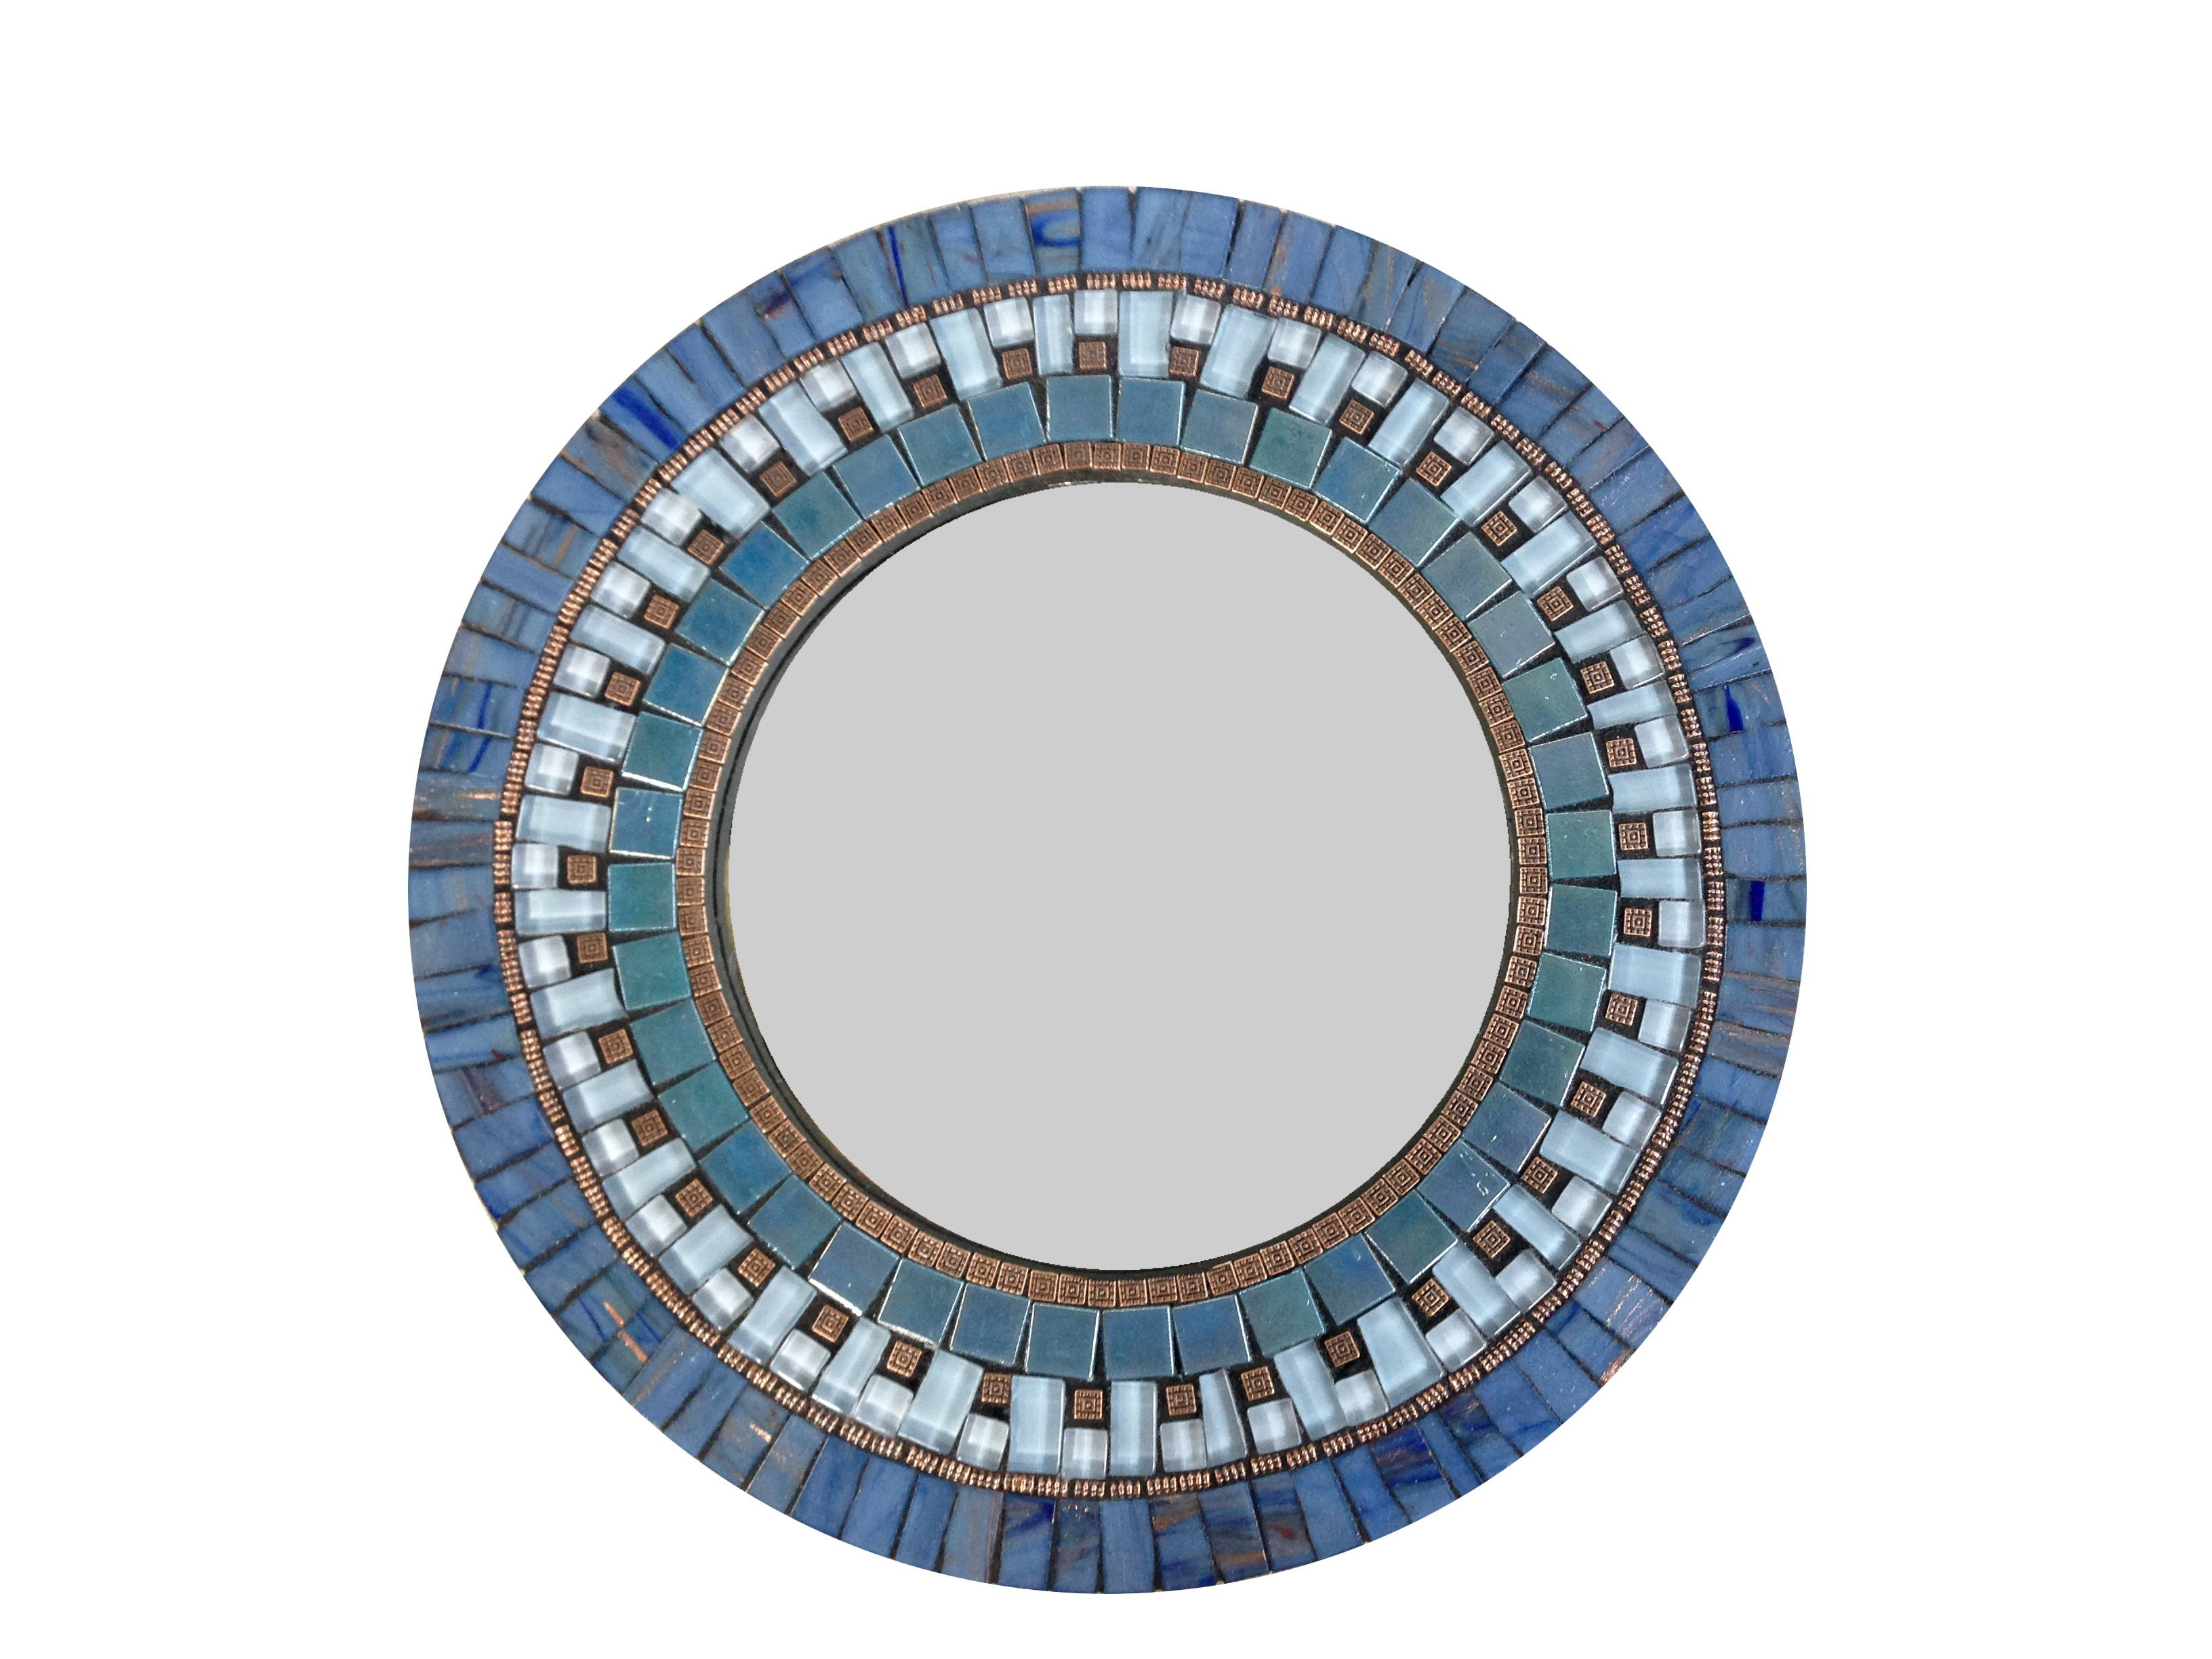 Opus Mosaics 39 Custom Mosaic Mirrorsjosh Hilzendeger Hand for Mosaic Wall Mirrors (Image 18 of 25)